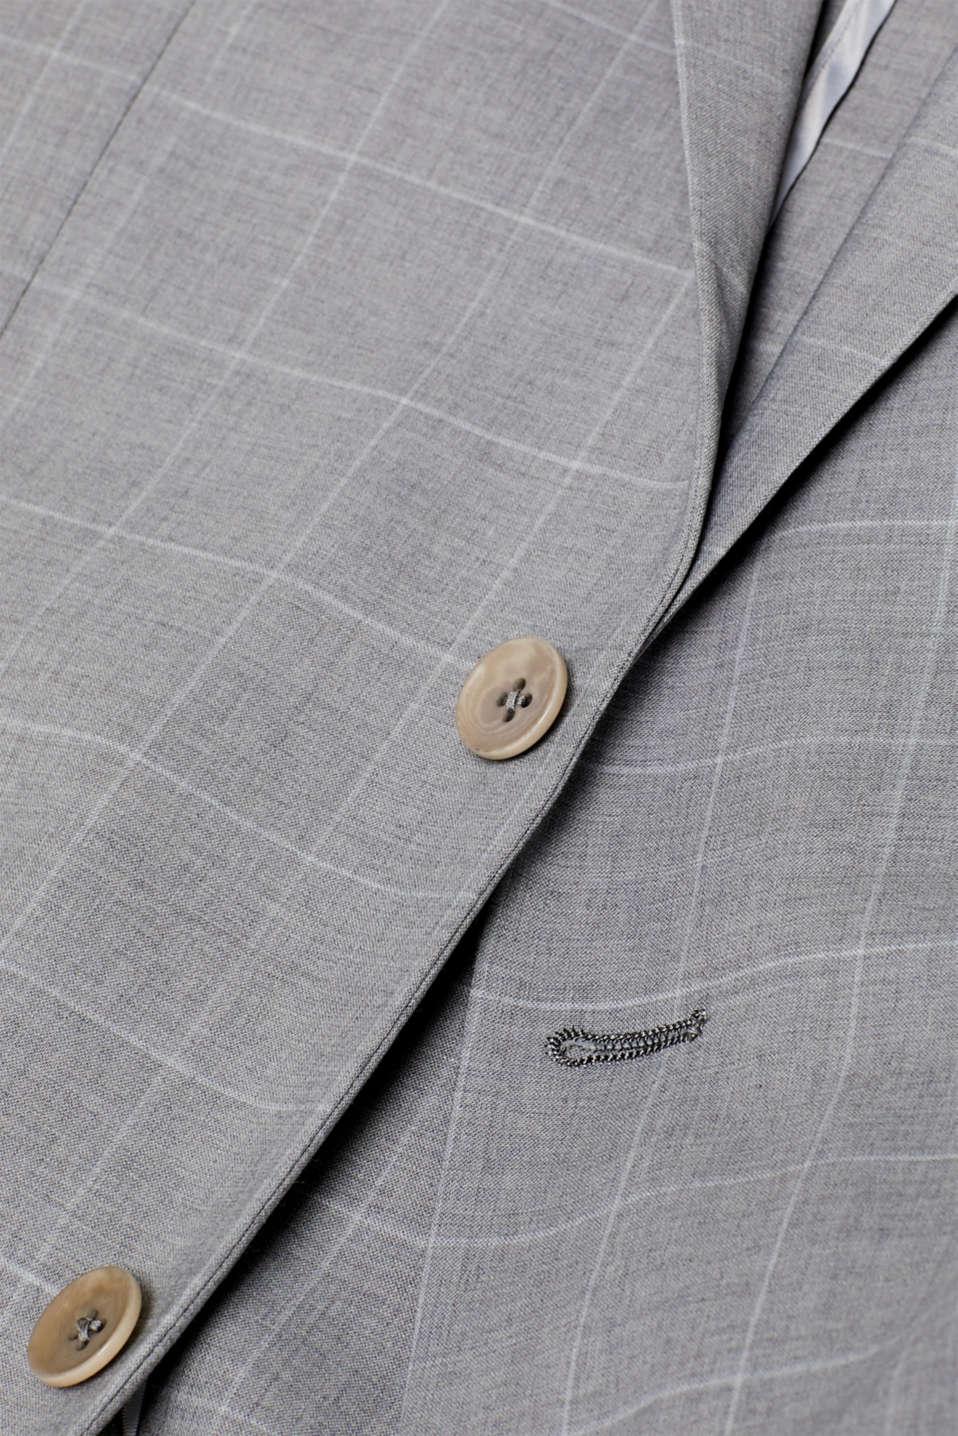 Blazers suit, LIGHT GREY, detail image number 4